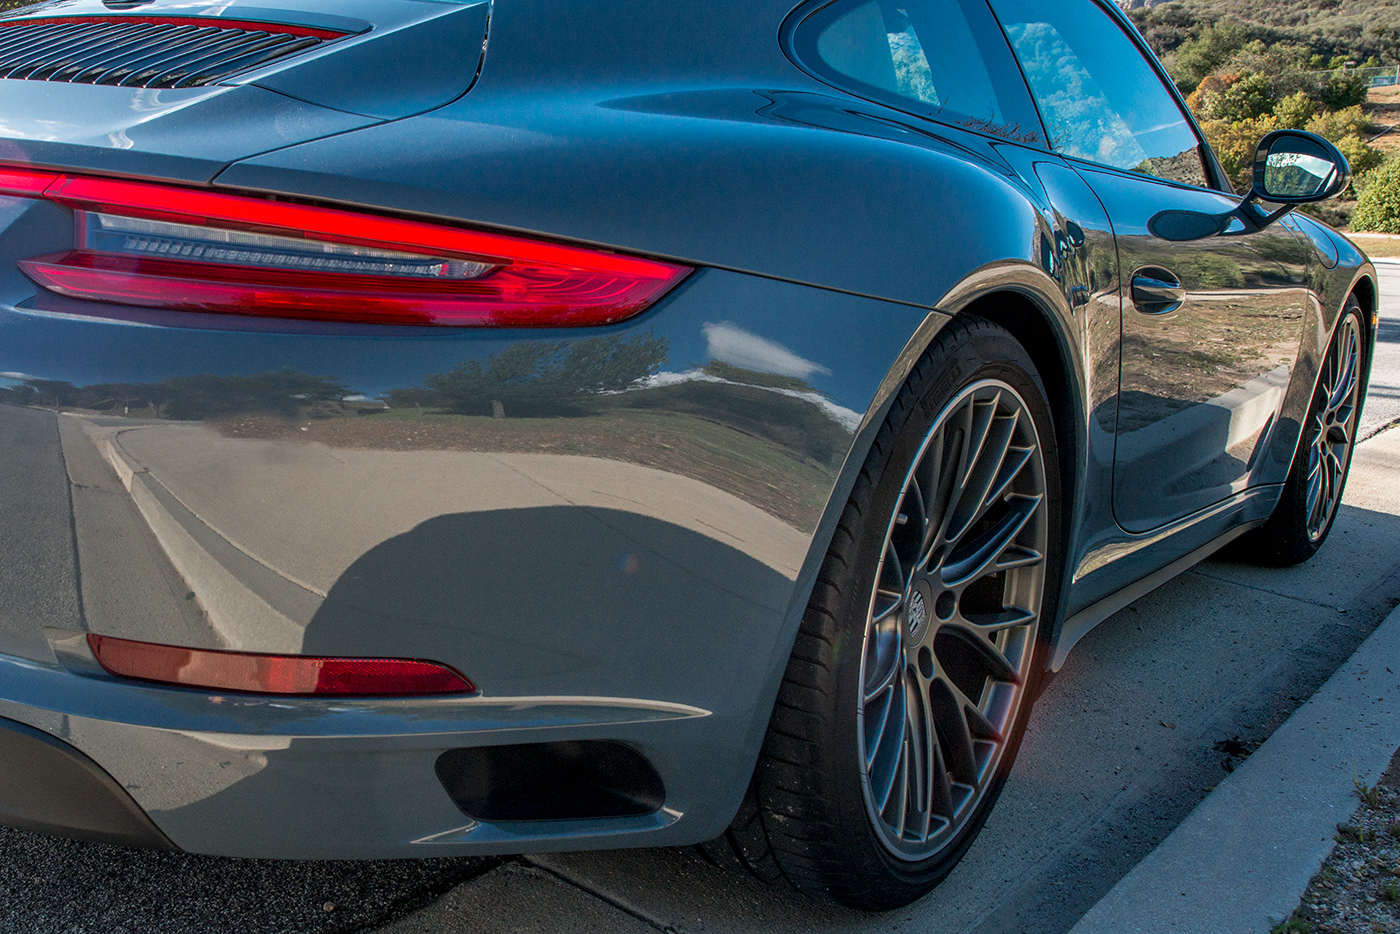 TrackWorthy - Porsche 911 C4S 991.2 - Canyon Roads - 05